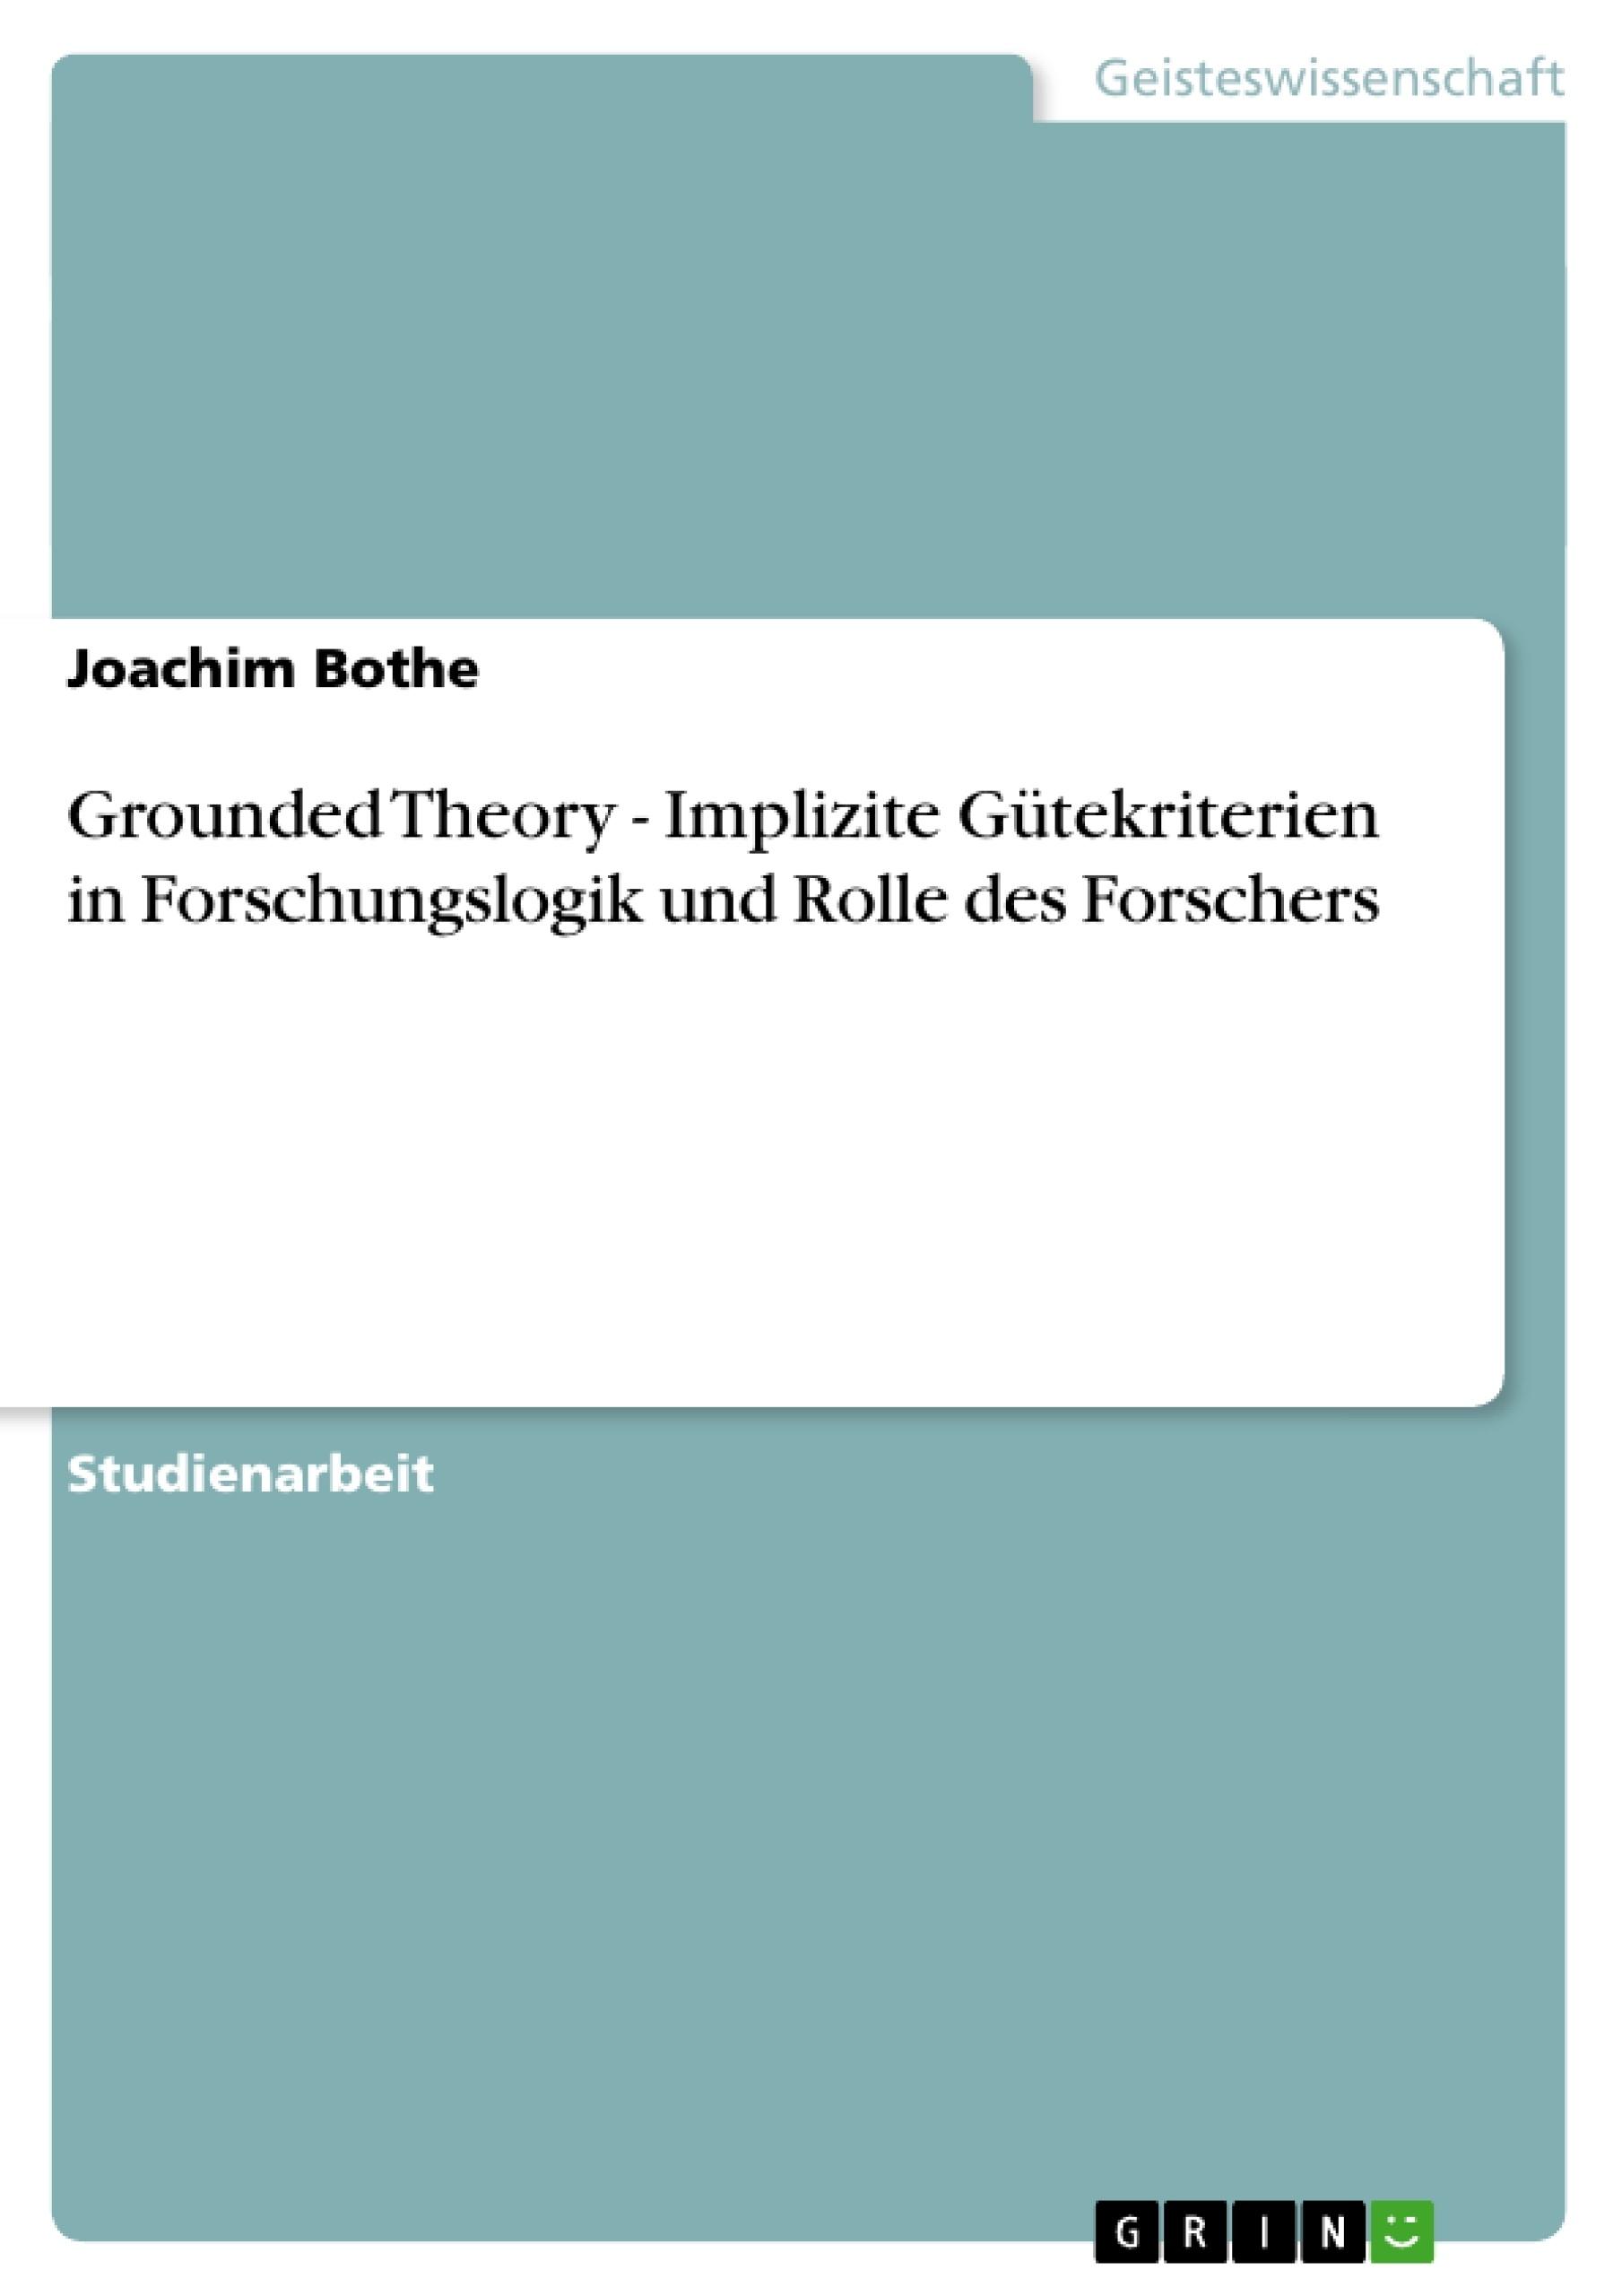 Titel: Grounded Theory - Implizite Gütekriterien in Forschungslogik und Rolle des Forschers